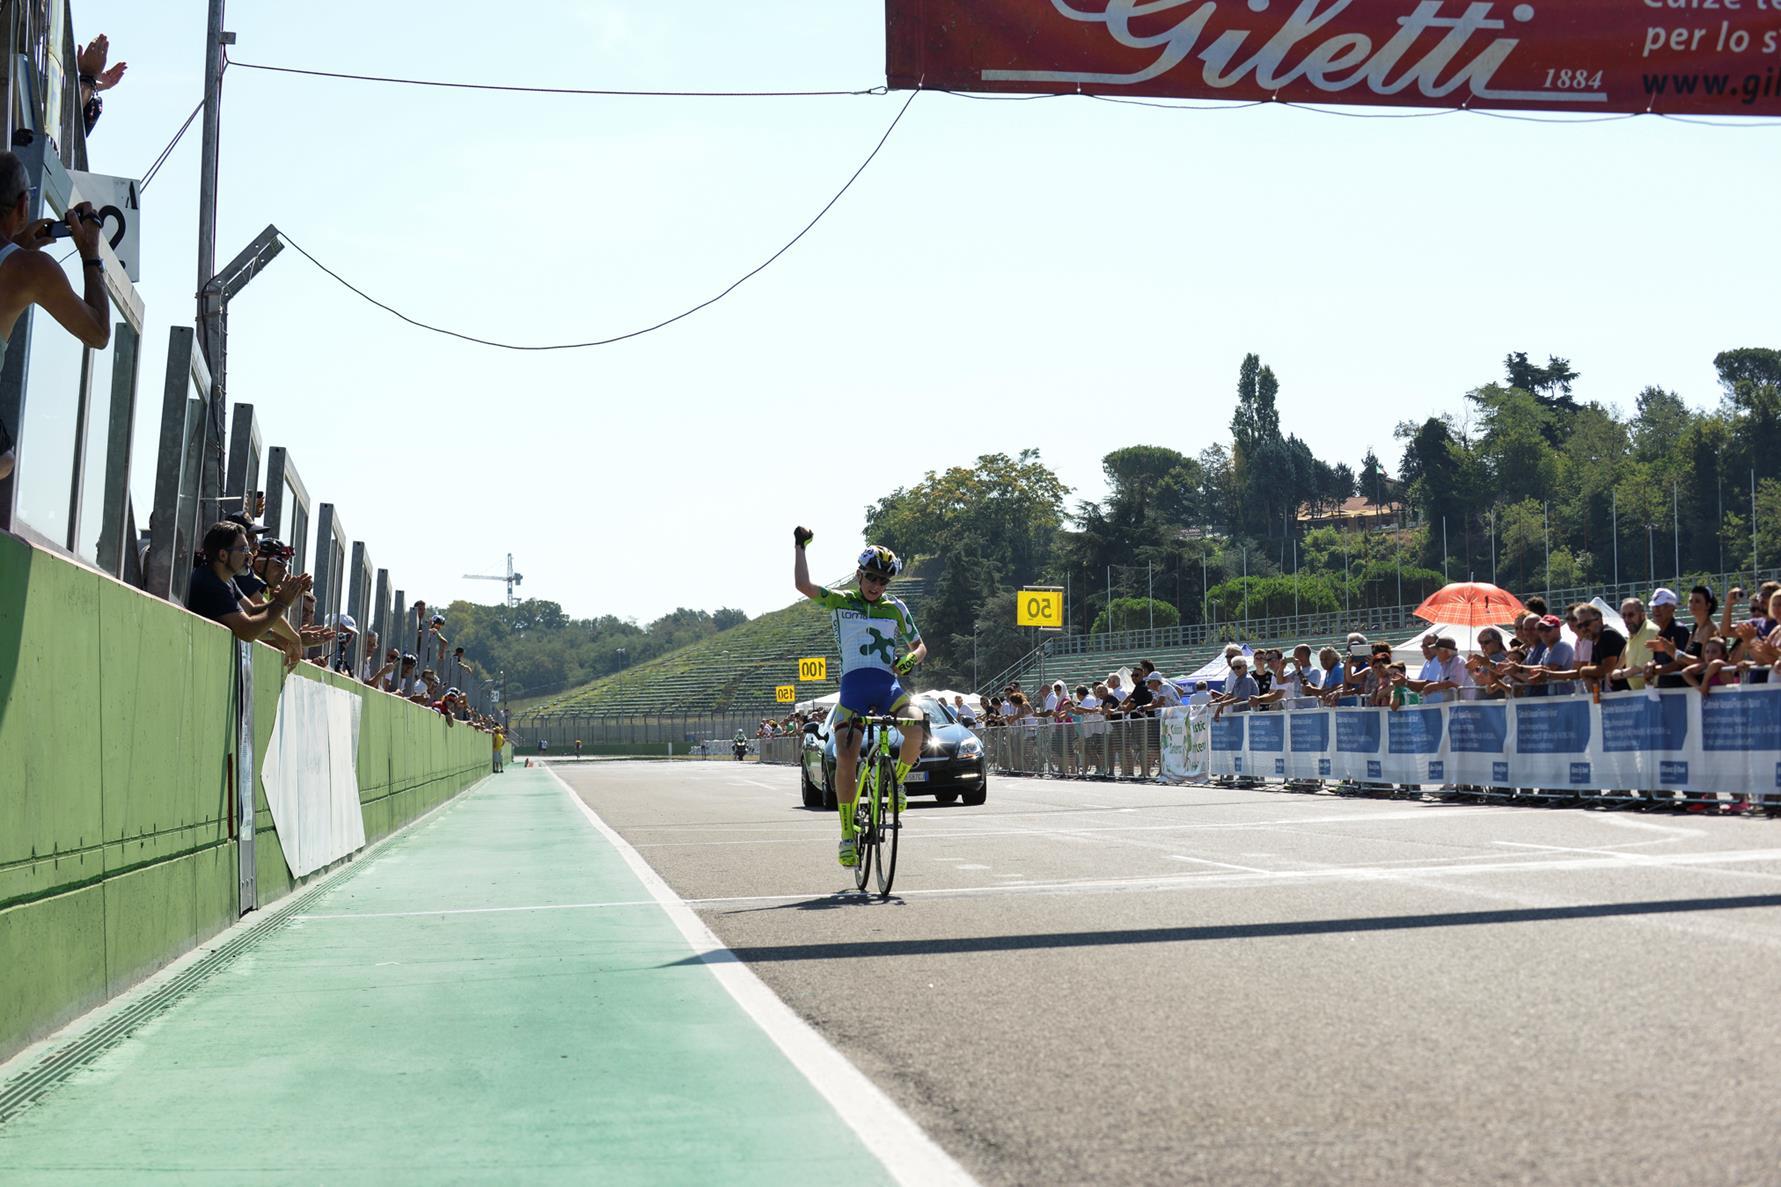 Gabriele Casalini vince la gara Esordienti 1° anno del Gp Fabbi Imola 2017